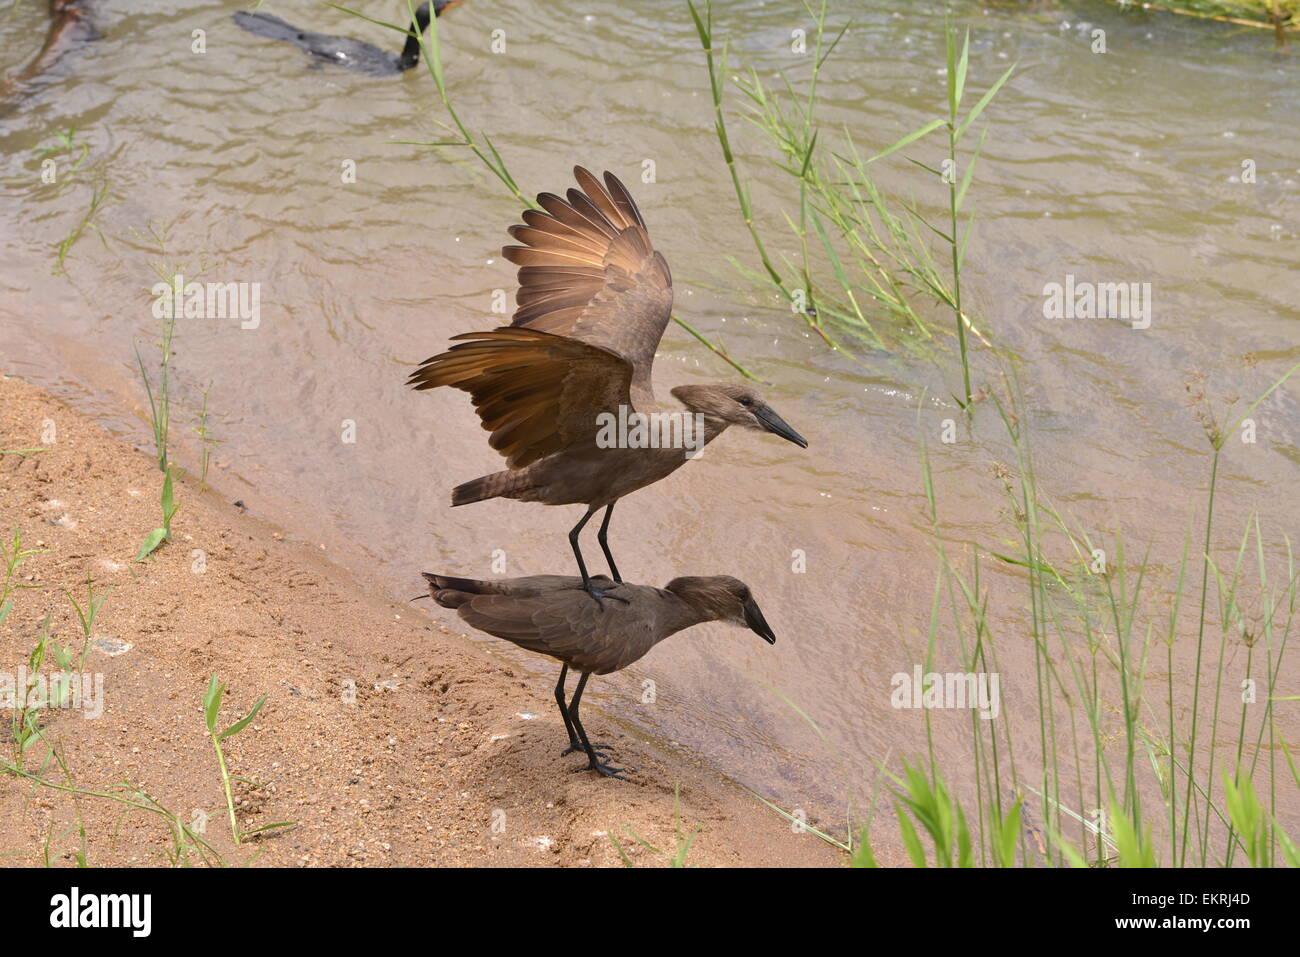 Hamerkop Vögel zu Paaren, die versuchen, in den weltberühmten Krüger Nationalpark, Mpumalanga, Südafrika. Stockbild